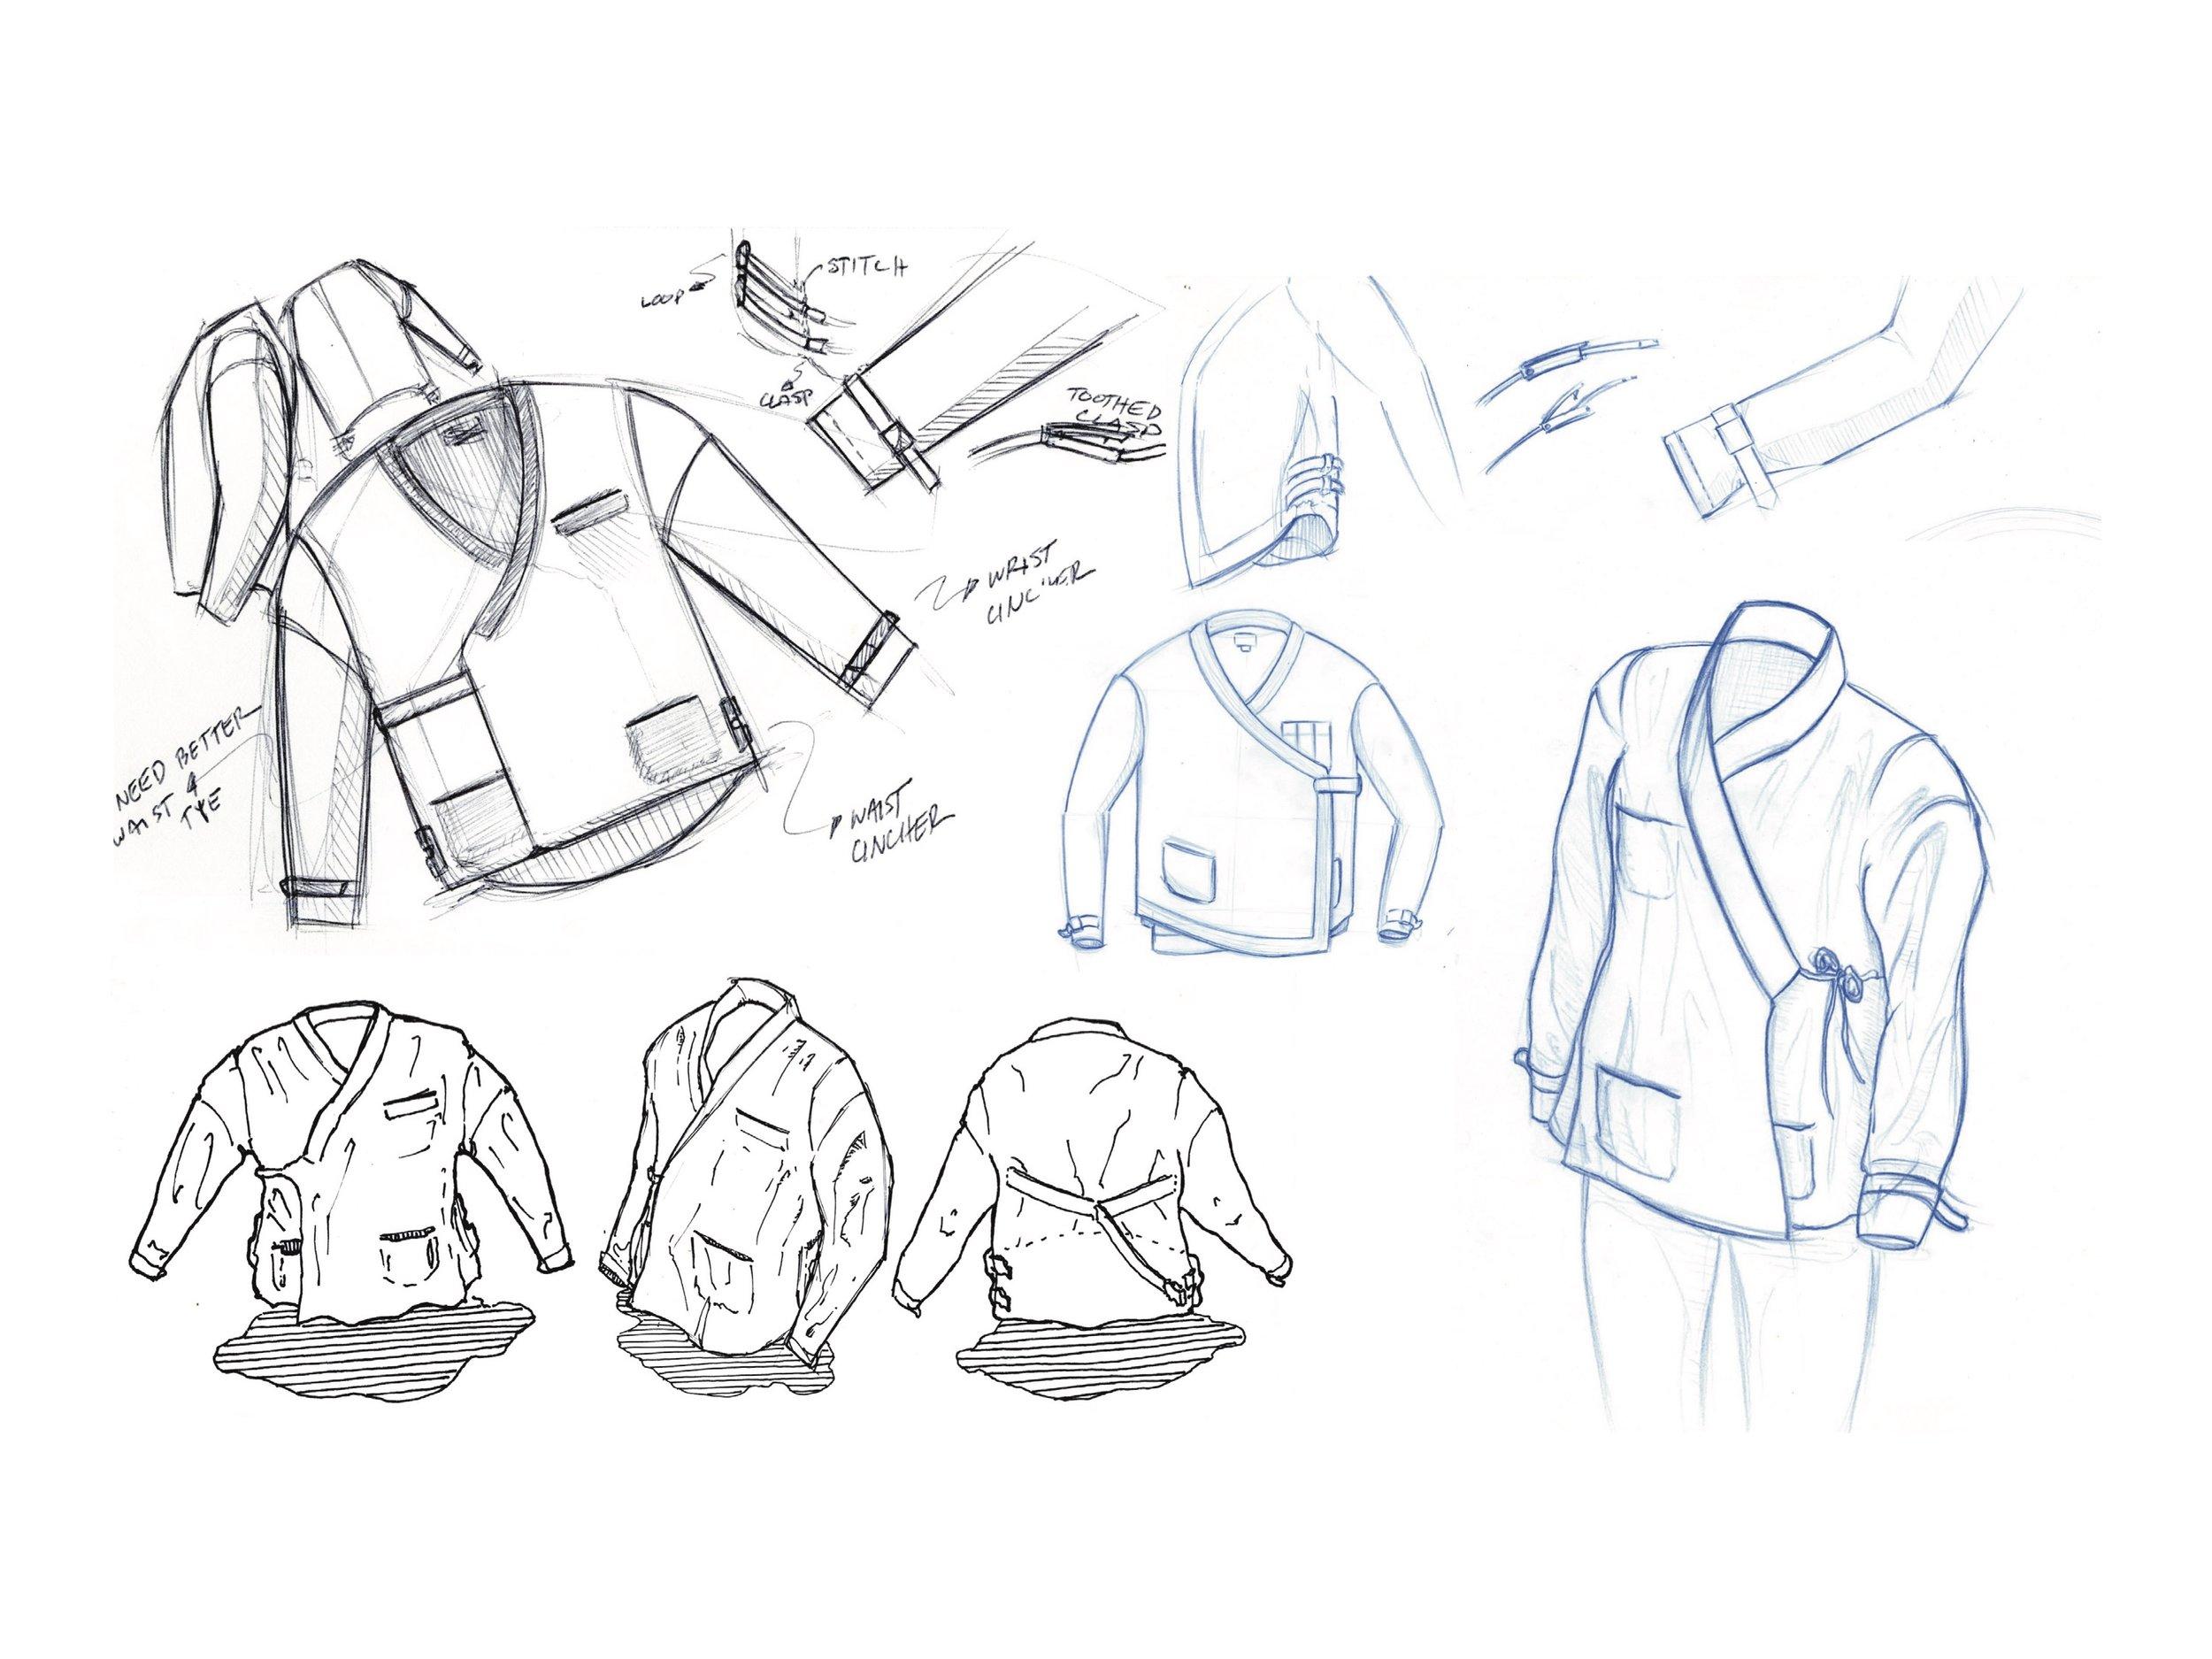 Shinobi Final Presentation sketch 2.jpg